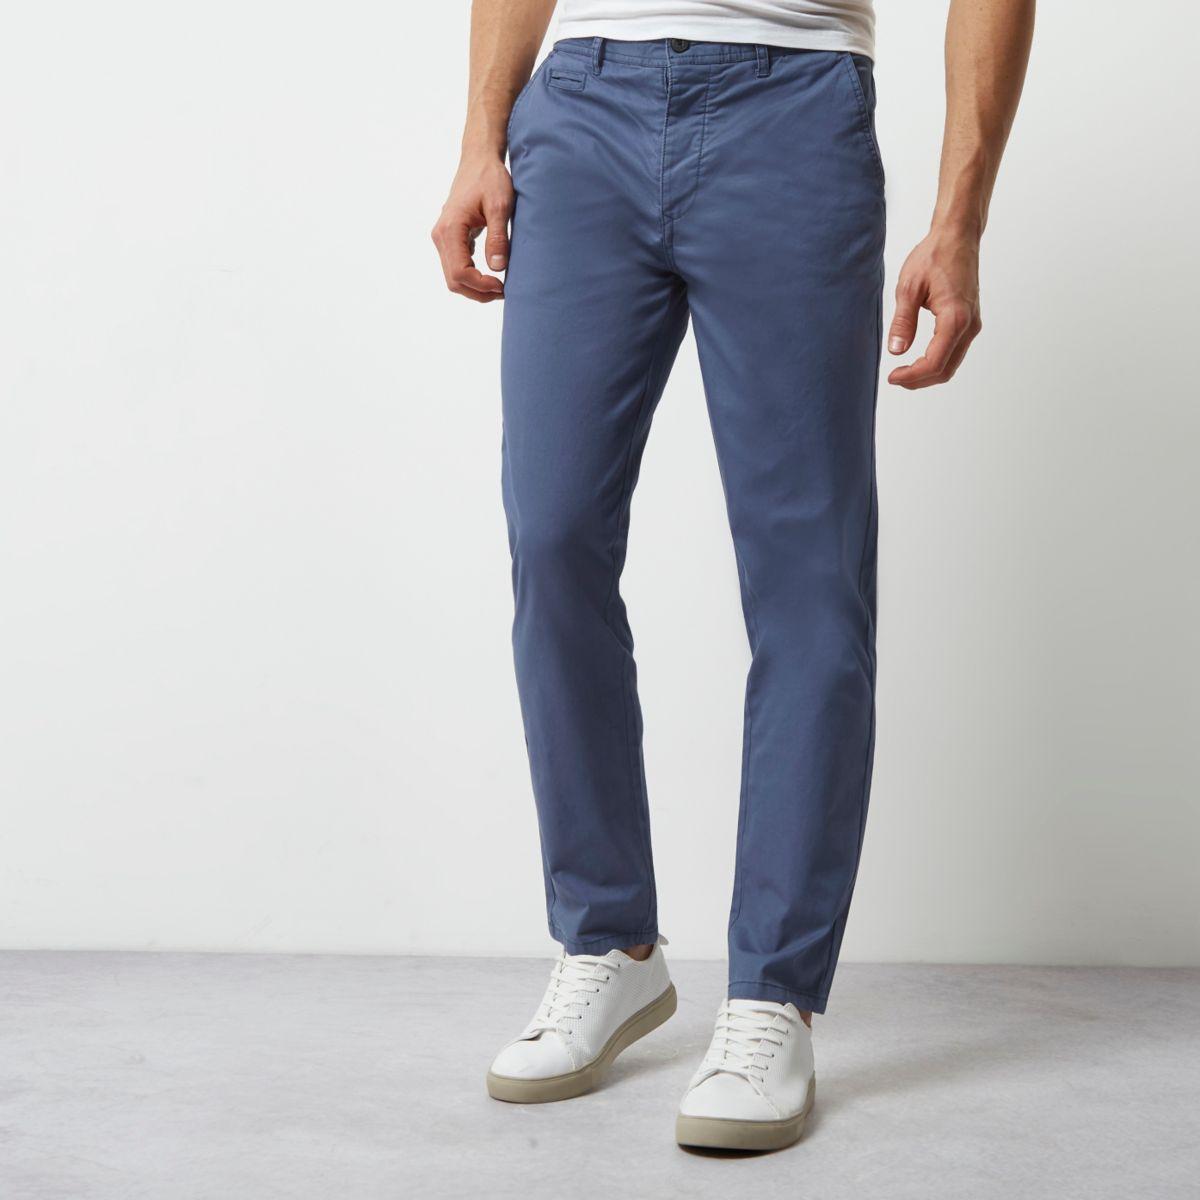 Dusty blue slim chino pants